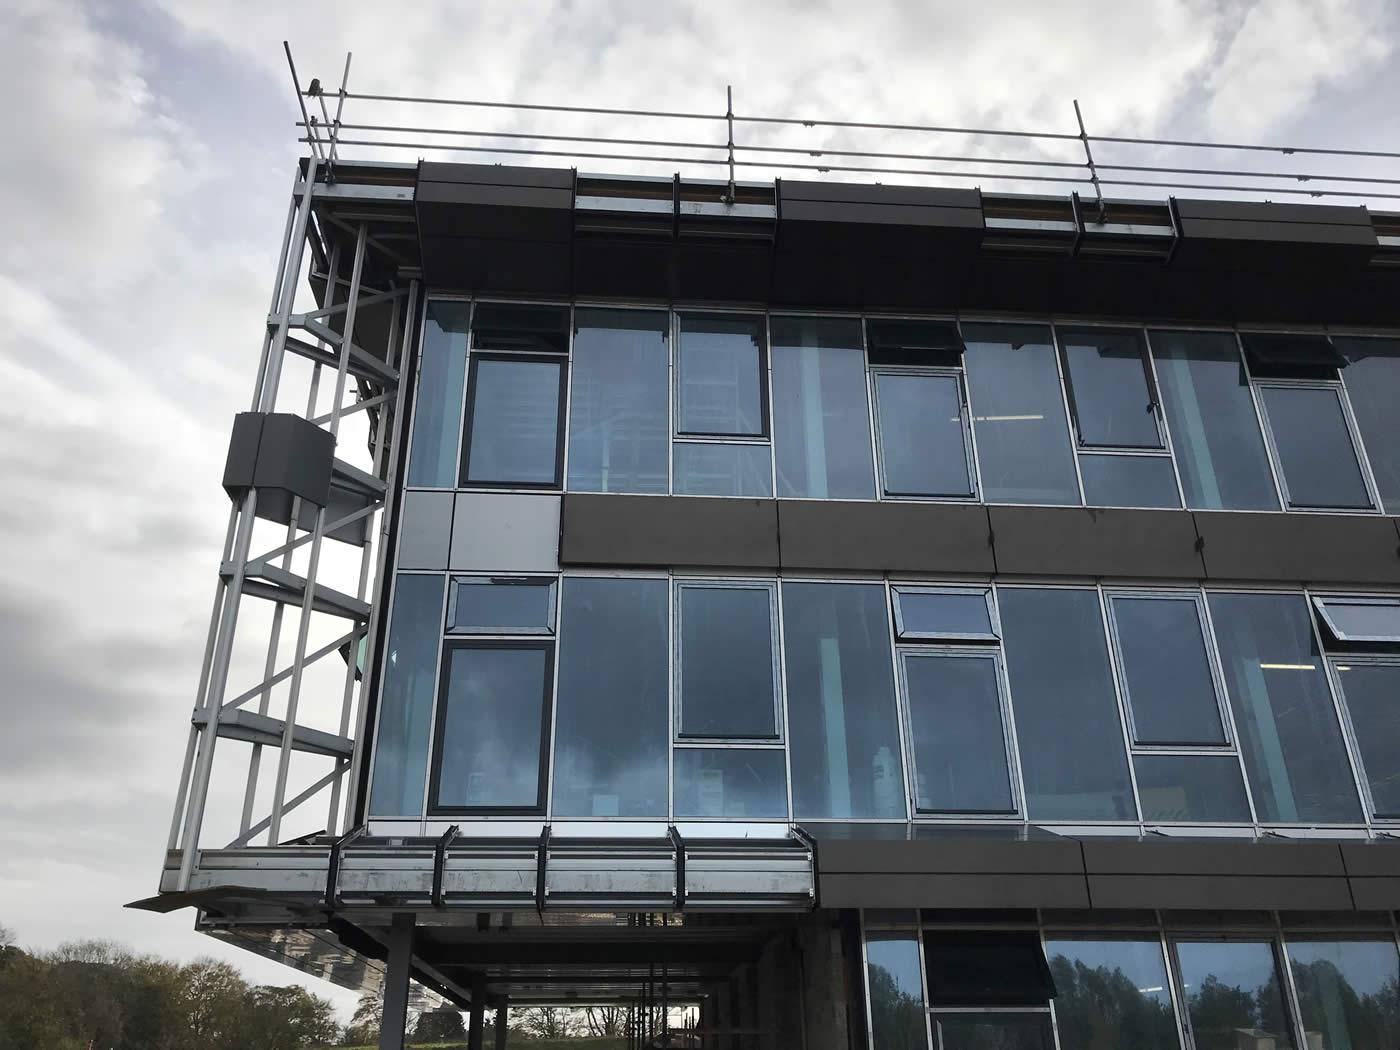 DAERA HQ Ballykelly